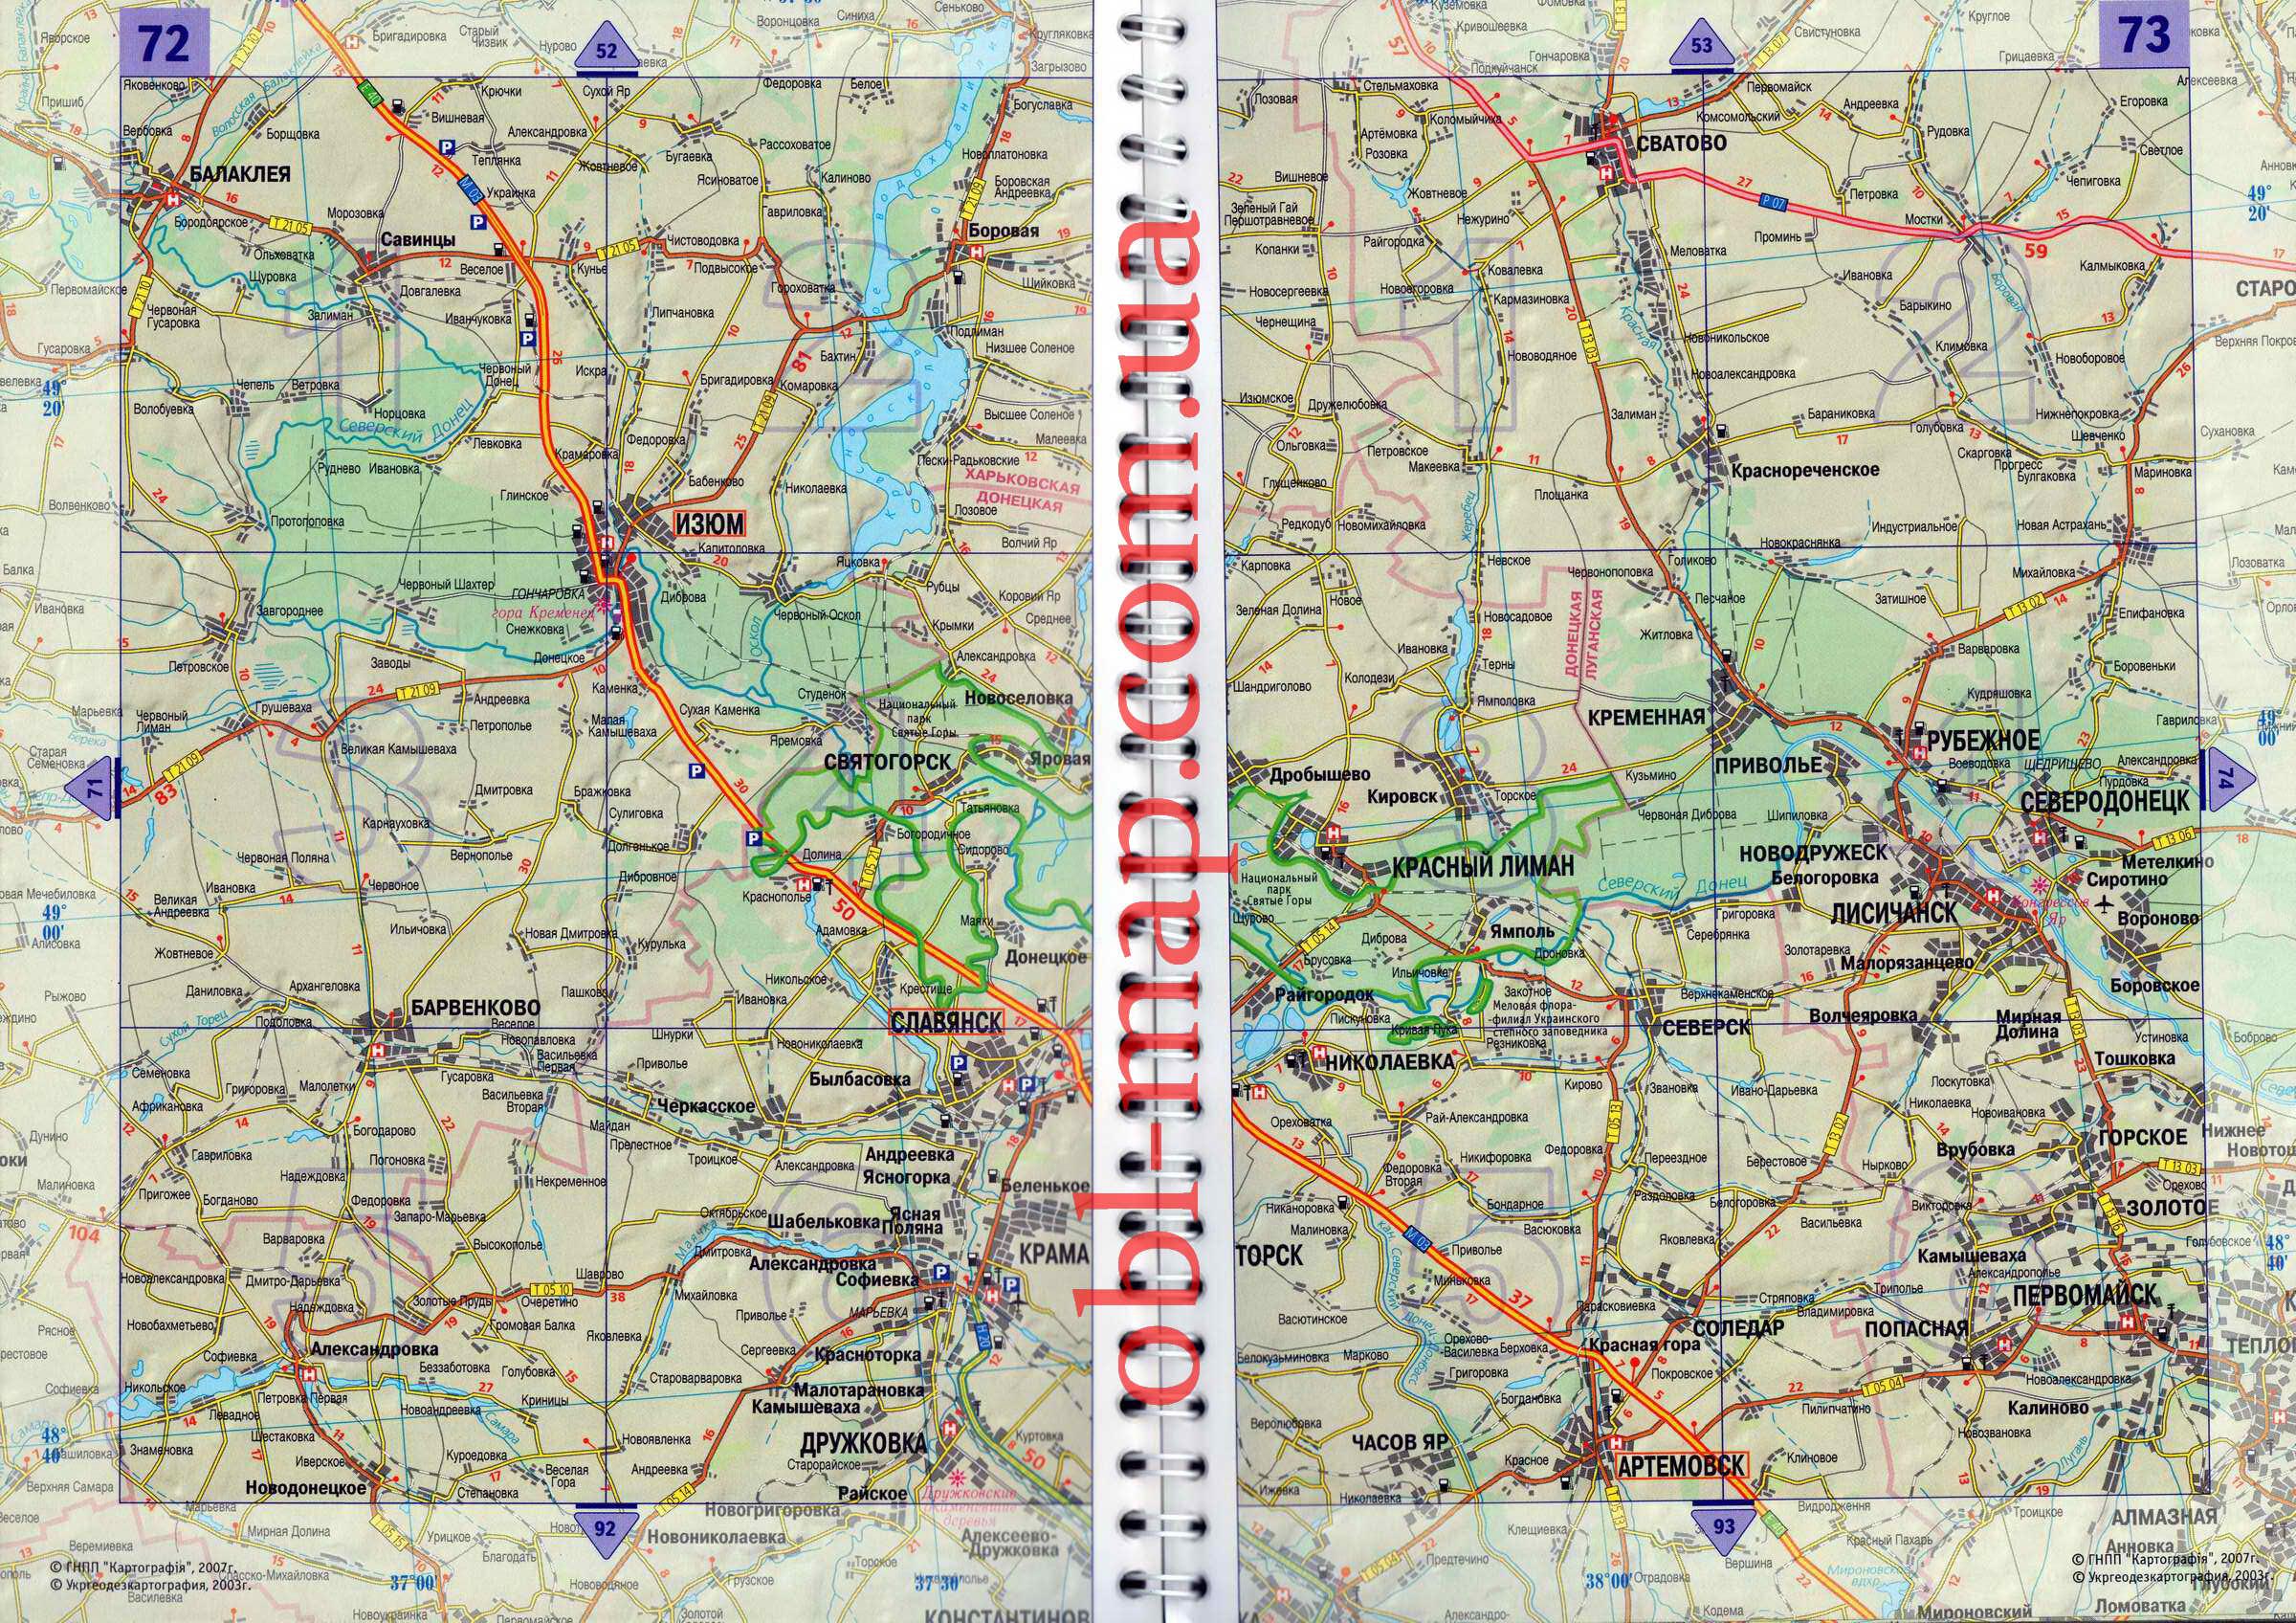 Карту Донецкой Области - enkistroy: http://enkistroy.weebly.com/blog/kartu-doneckoj-oblasti